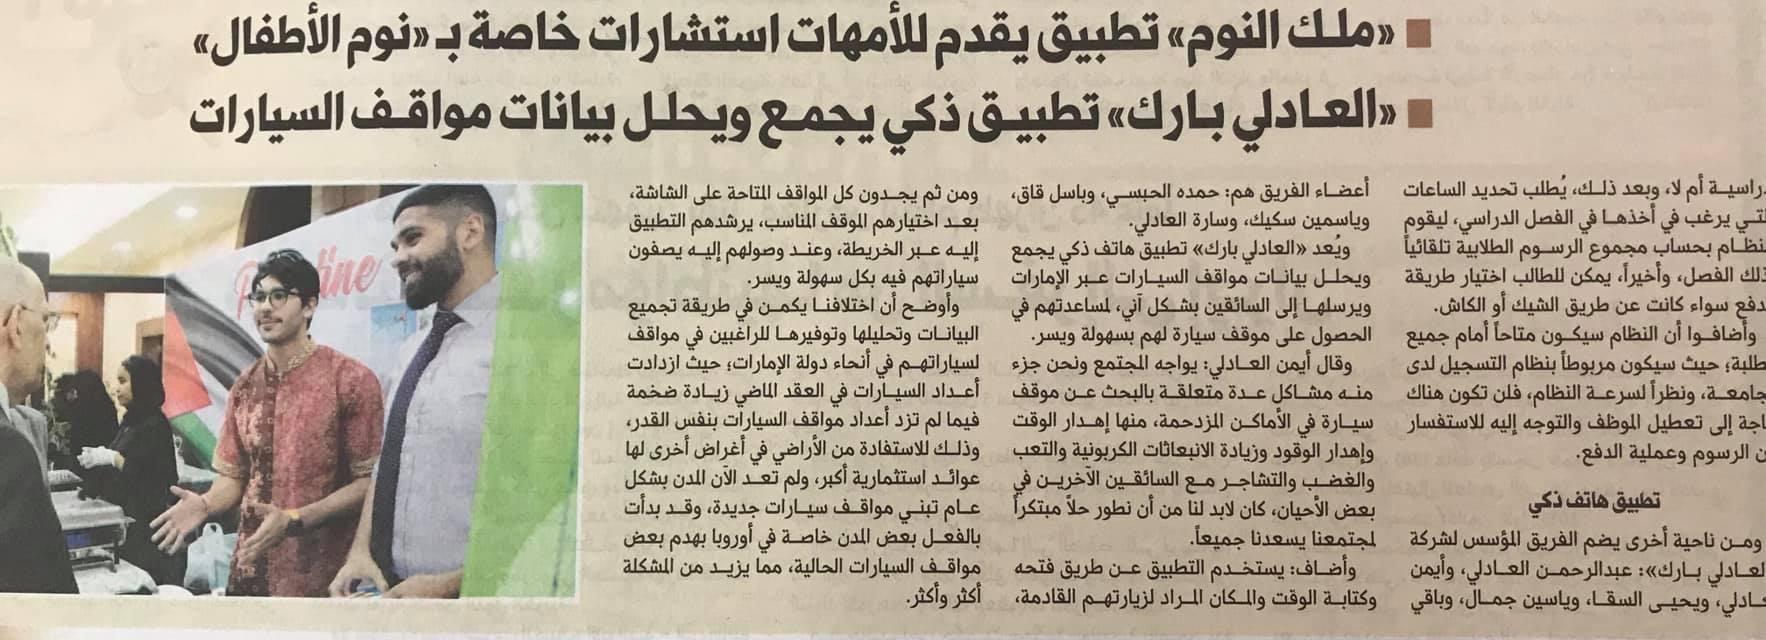 Arabic AlKhaleej Newspaper